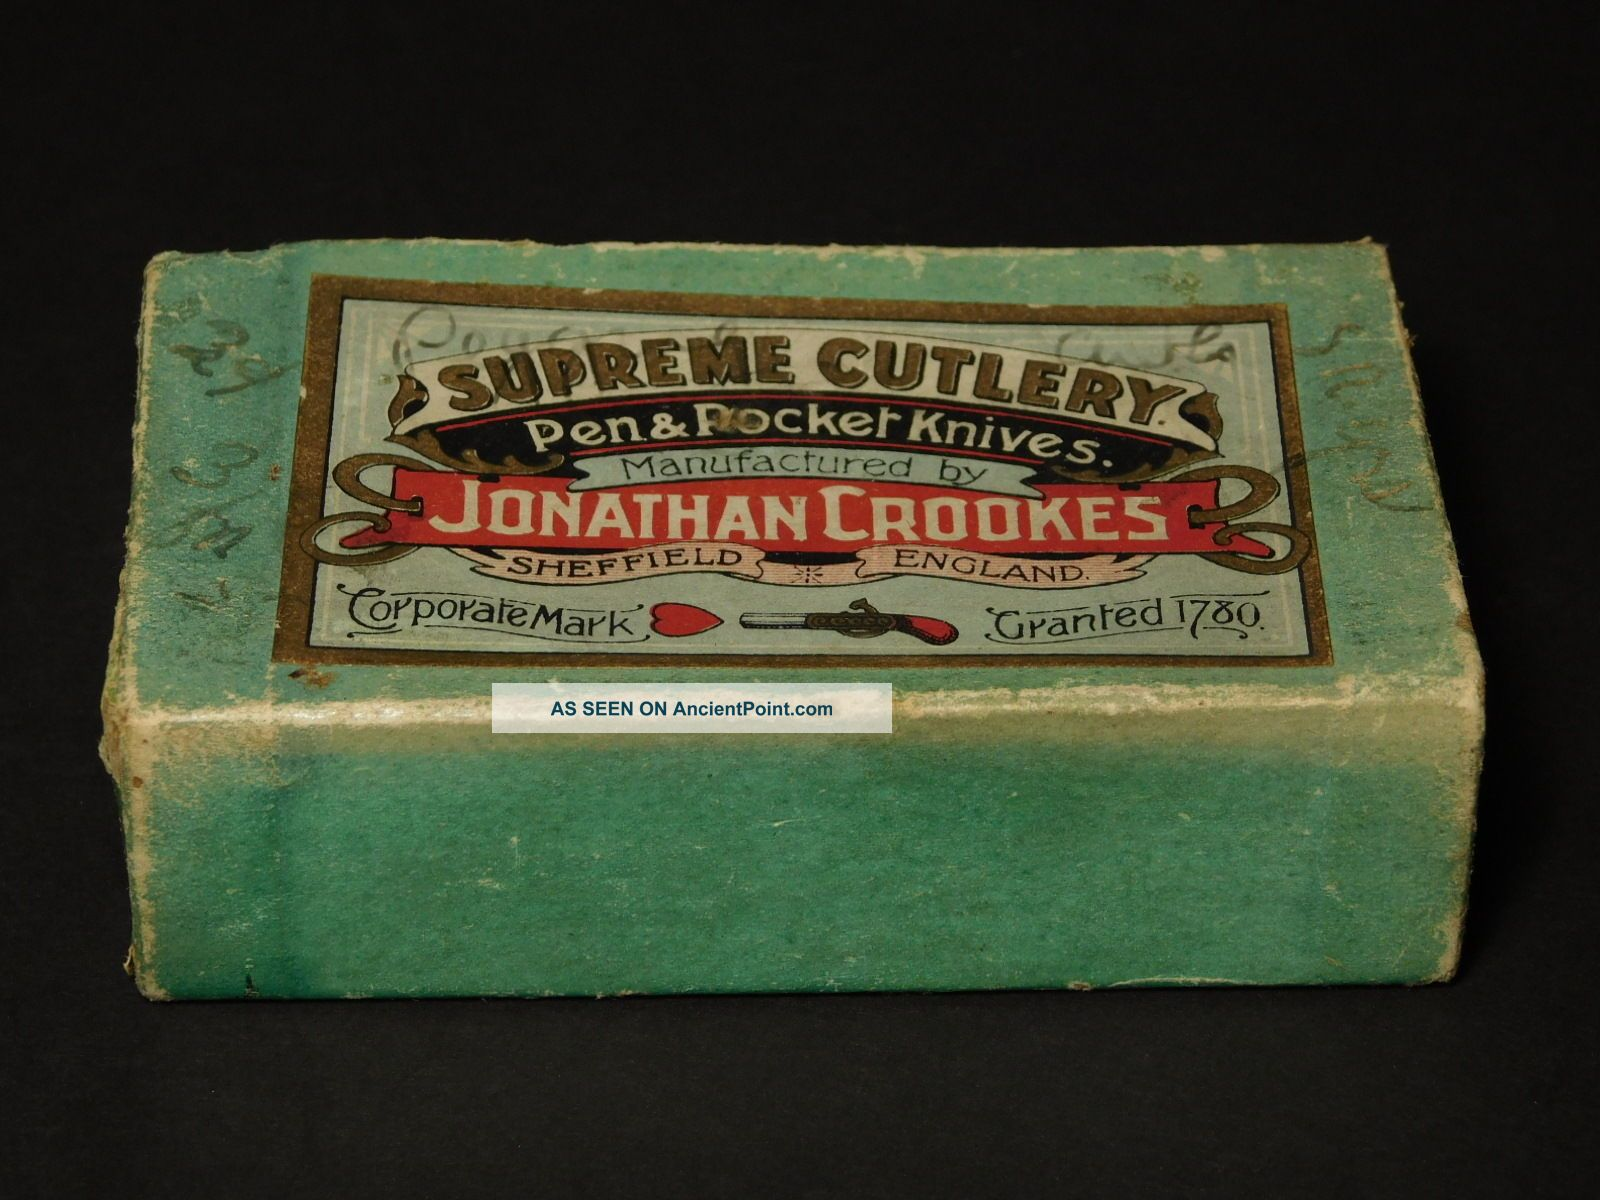 Jonathan Crookes Supreme Cutlery Pen & Pocket Knives Box Of Harness Awls Needles Needles & Cases photo